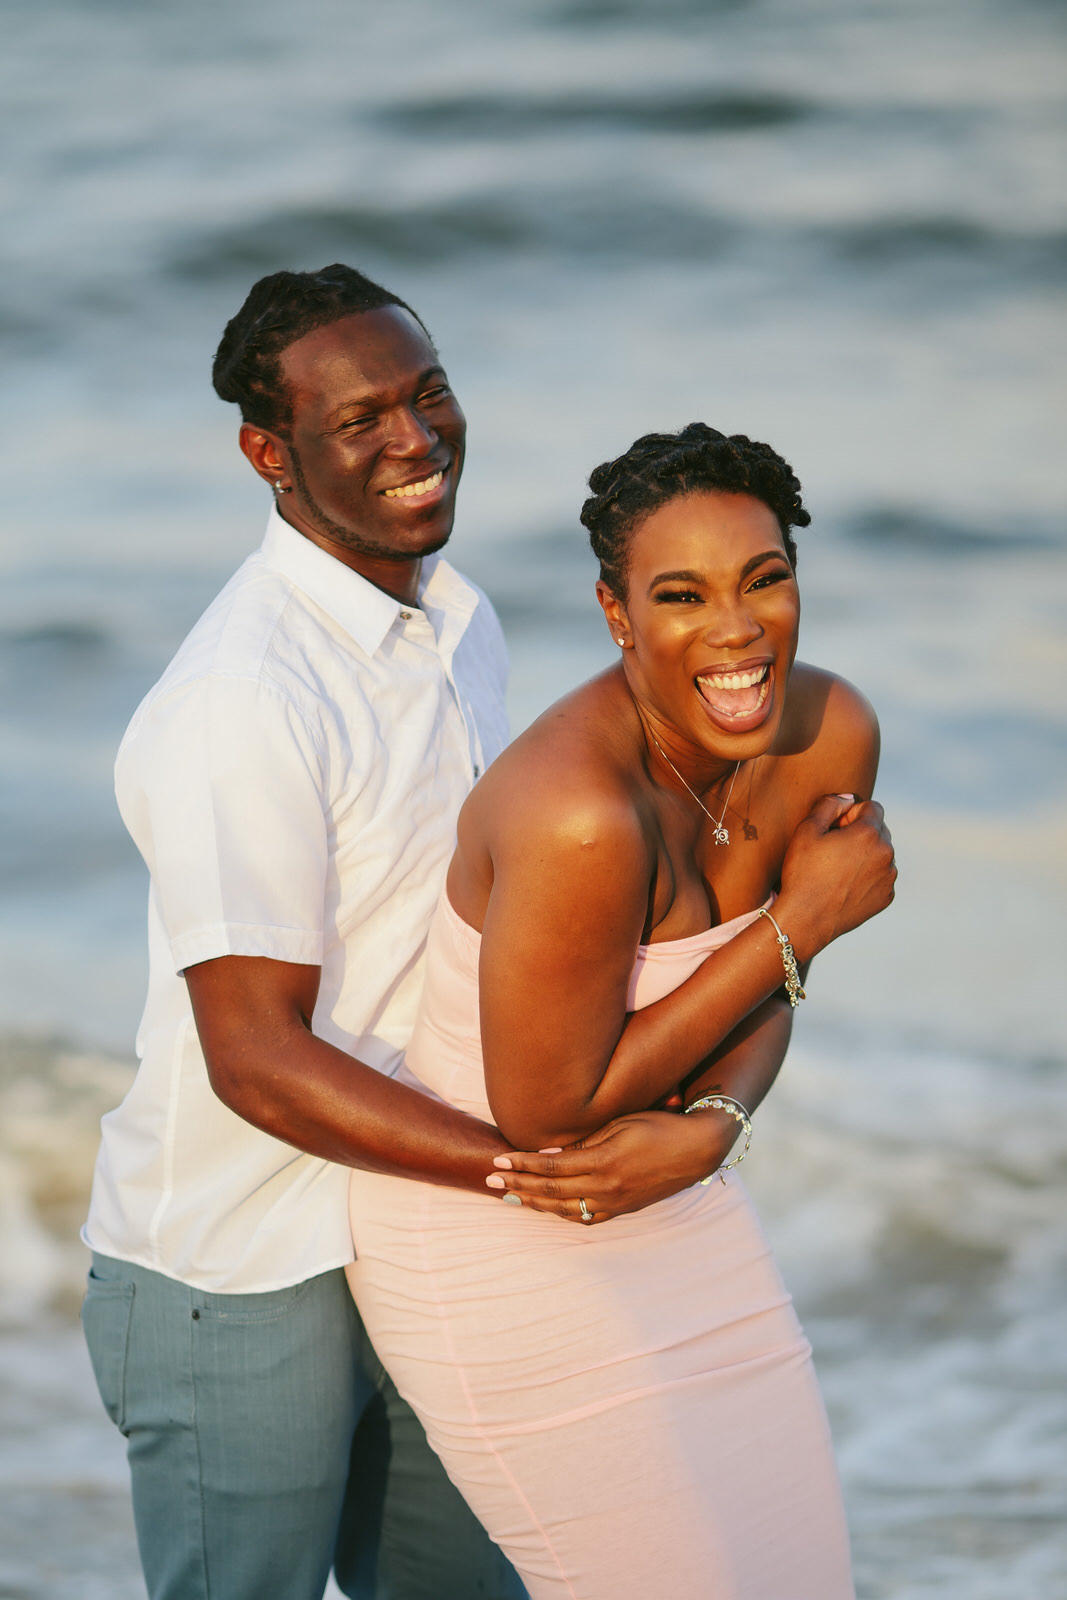 beachy-engagement-portraits-fort-lauderale-tiny-house-photo-wedding-photographer-35.jpg